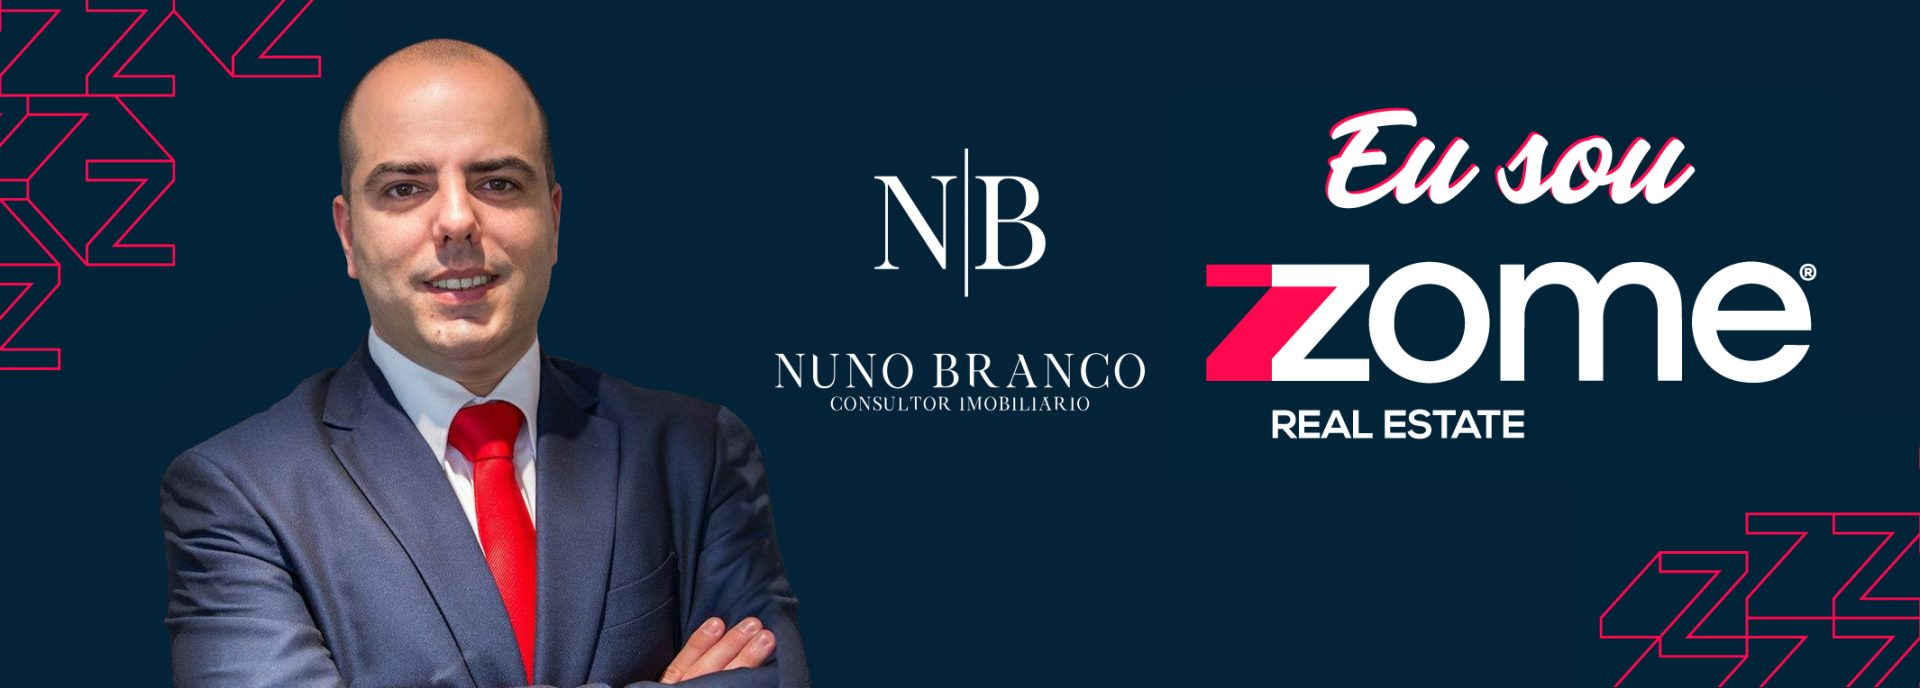 NUNO BRANCO